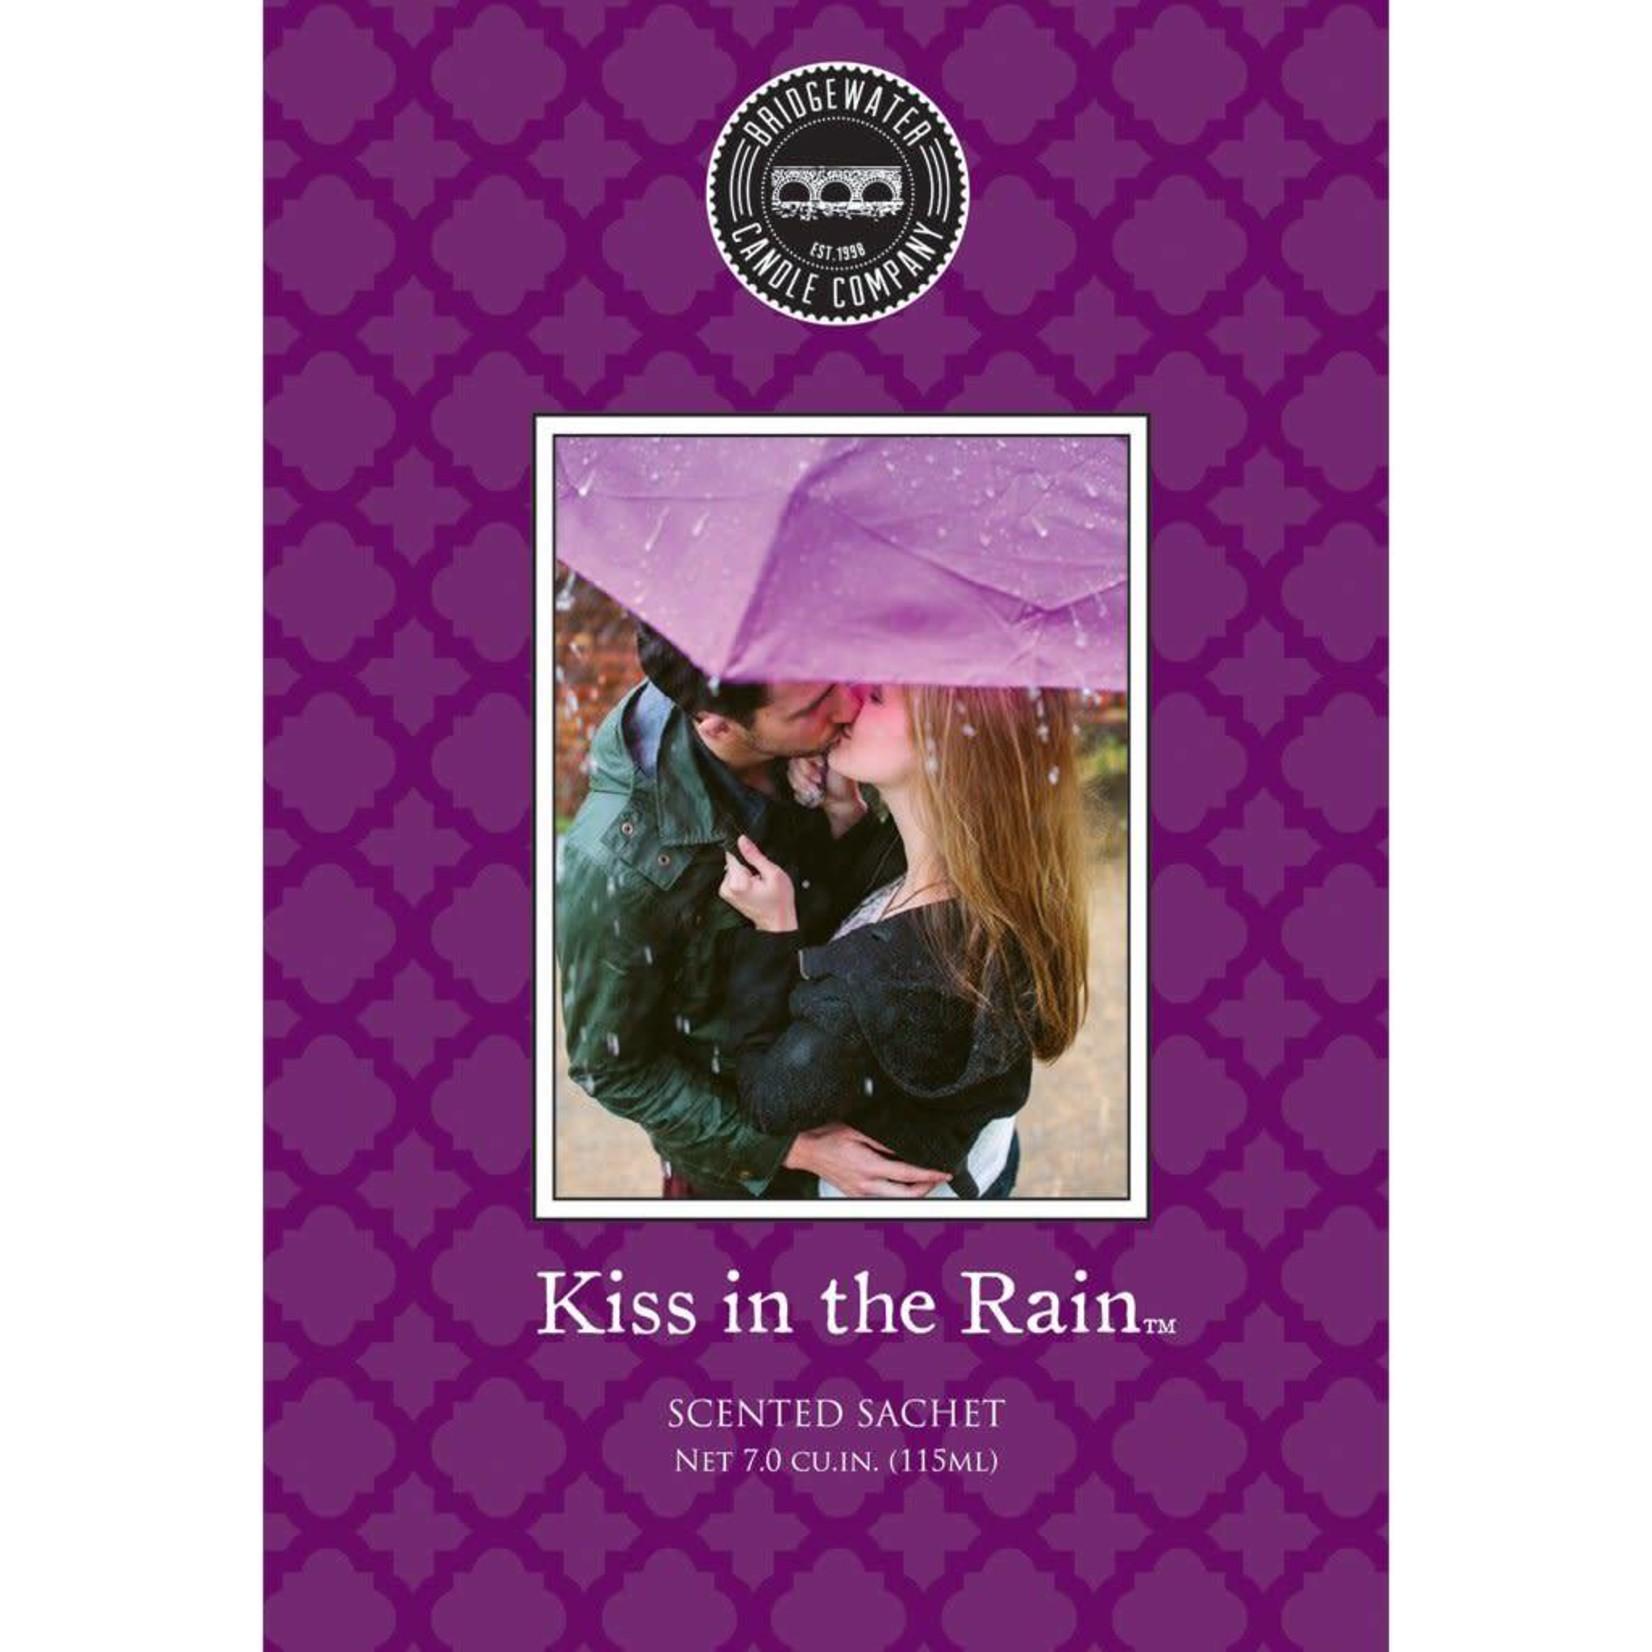 Bridge Water Candle Company BRIDGEWATER KISS IN THE RAIN FRAGRANCE SACHET